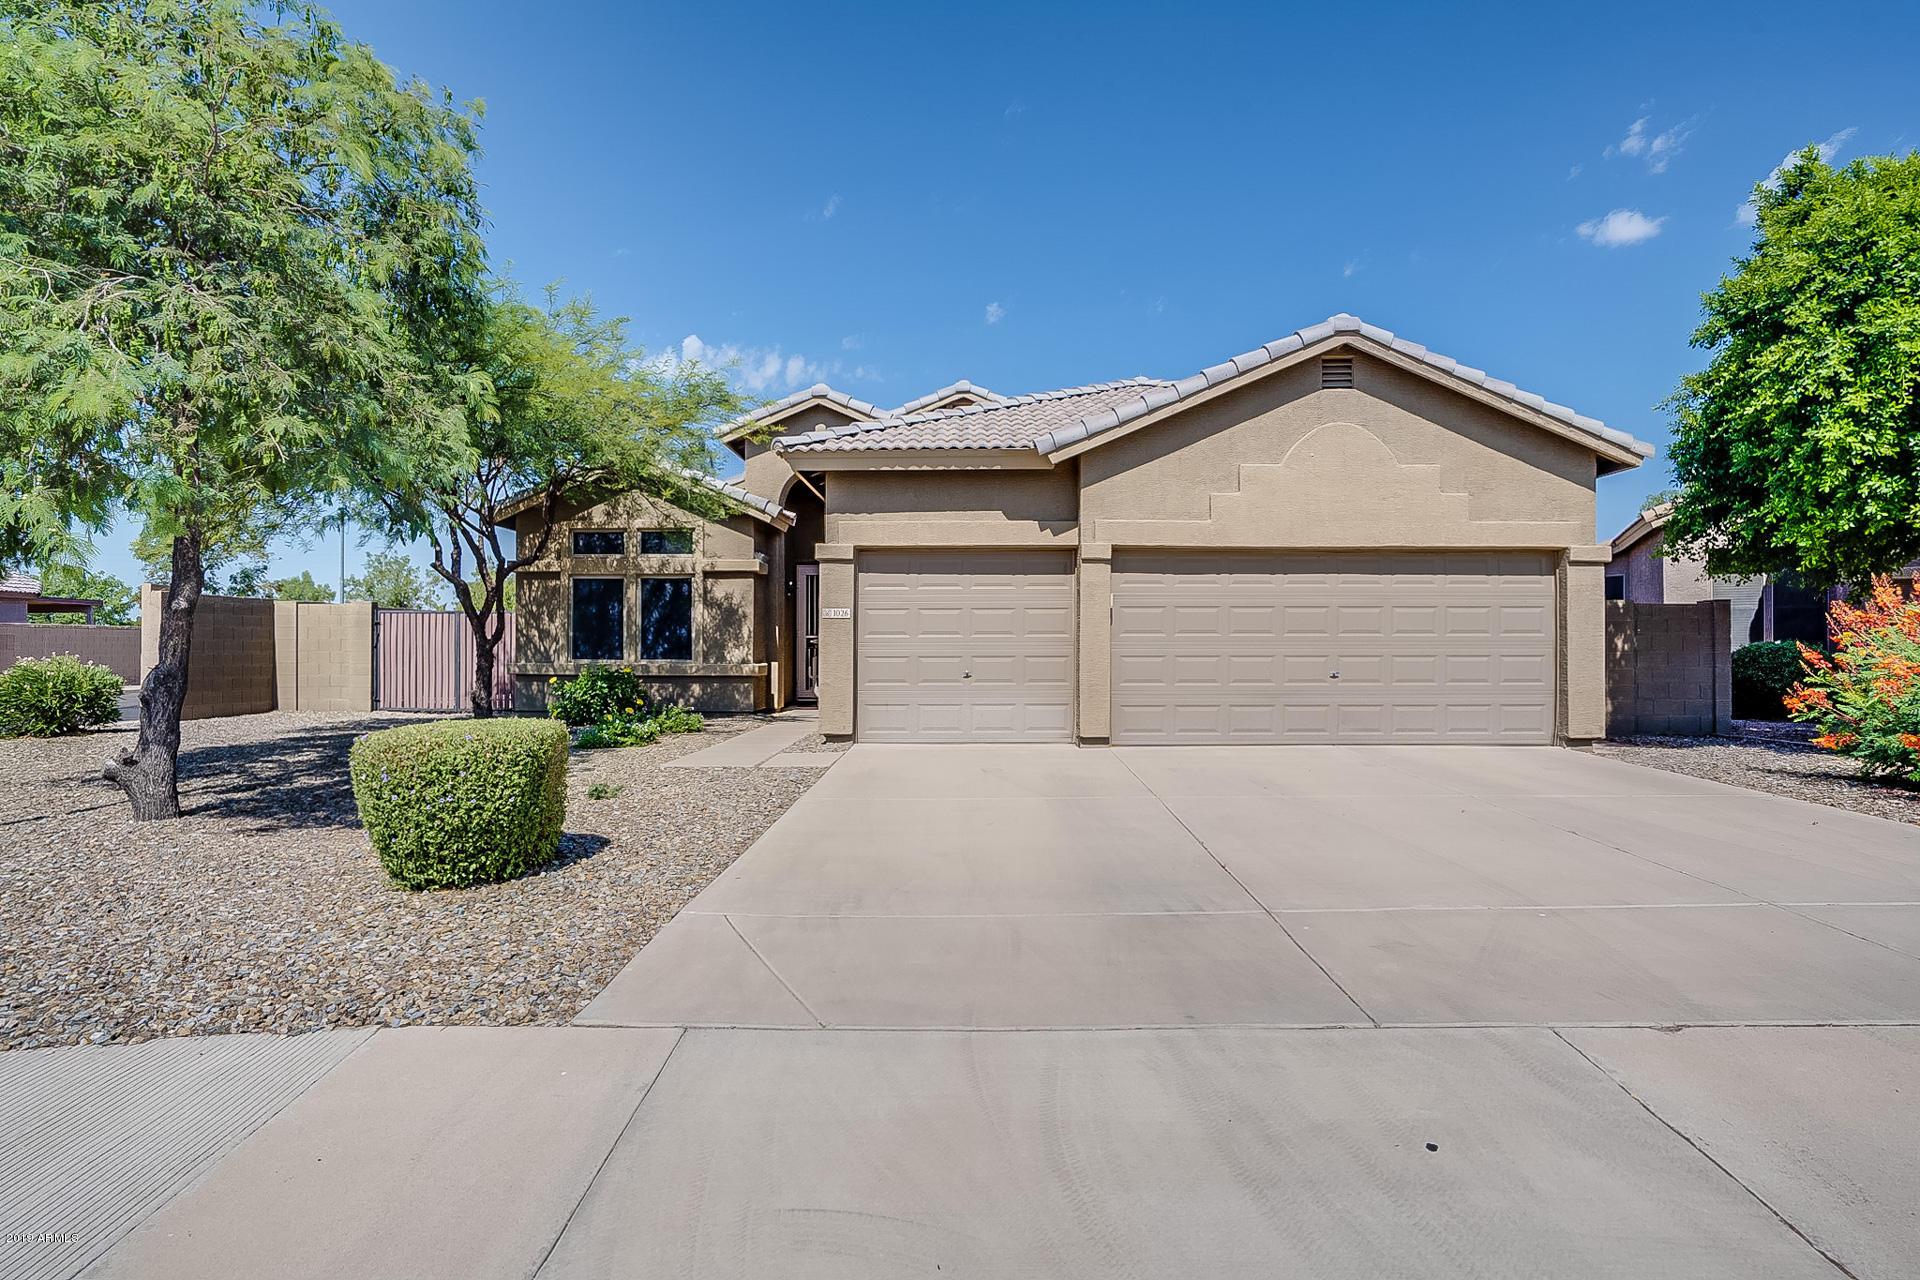 Photo of 1026 S Valle Verde --, Mesa, AZ 85208